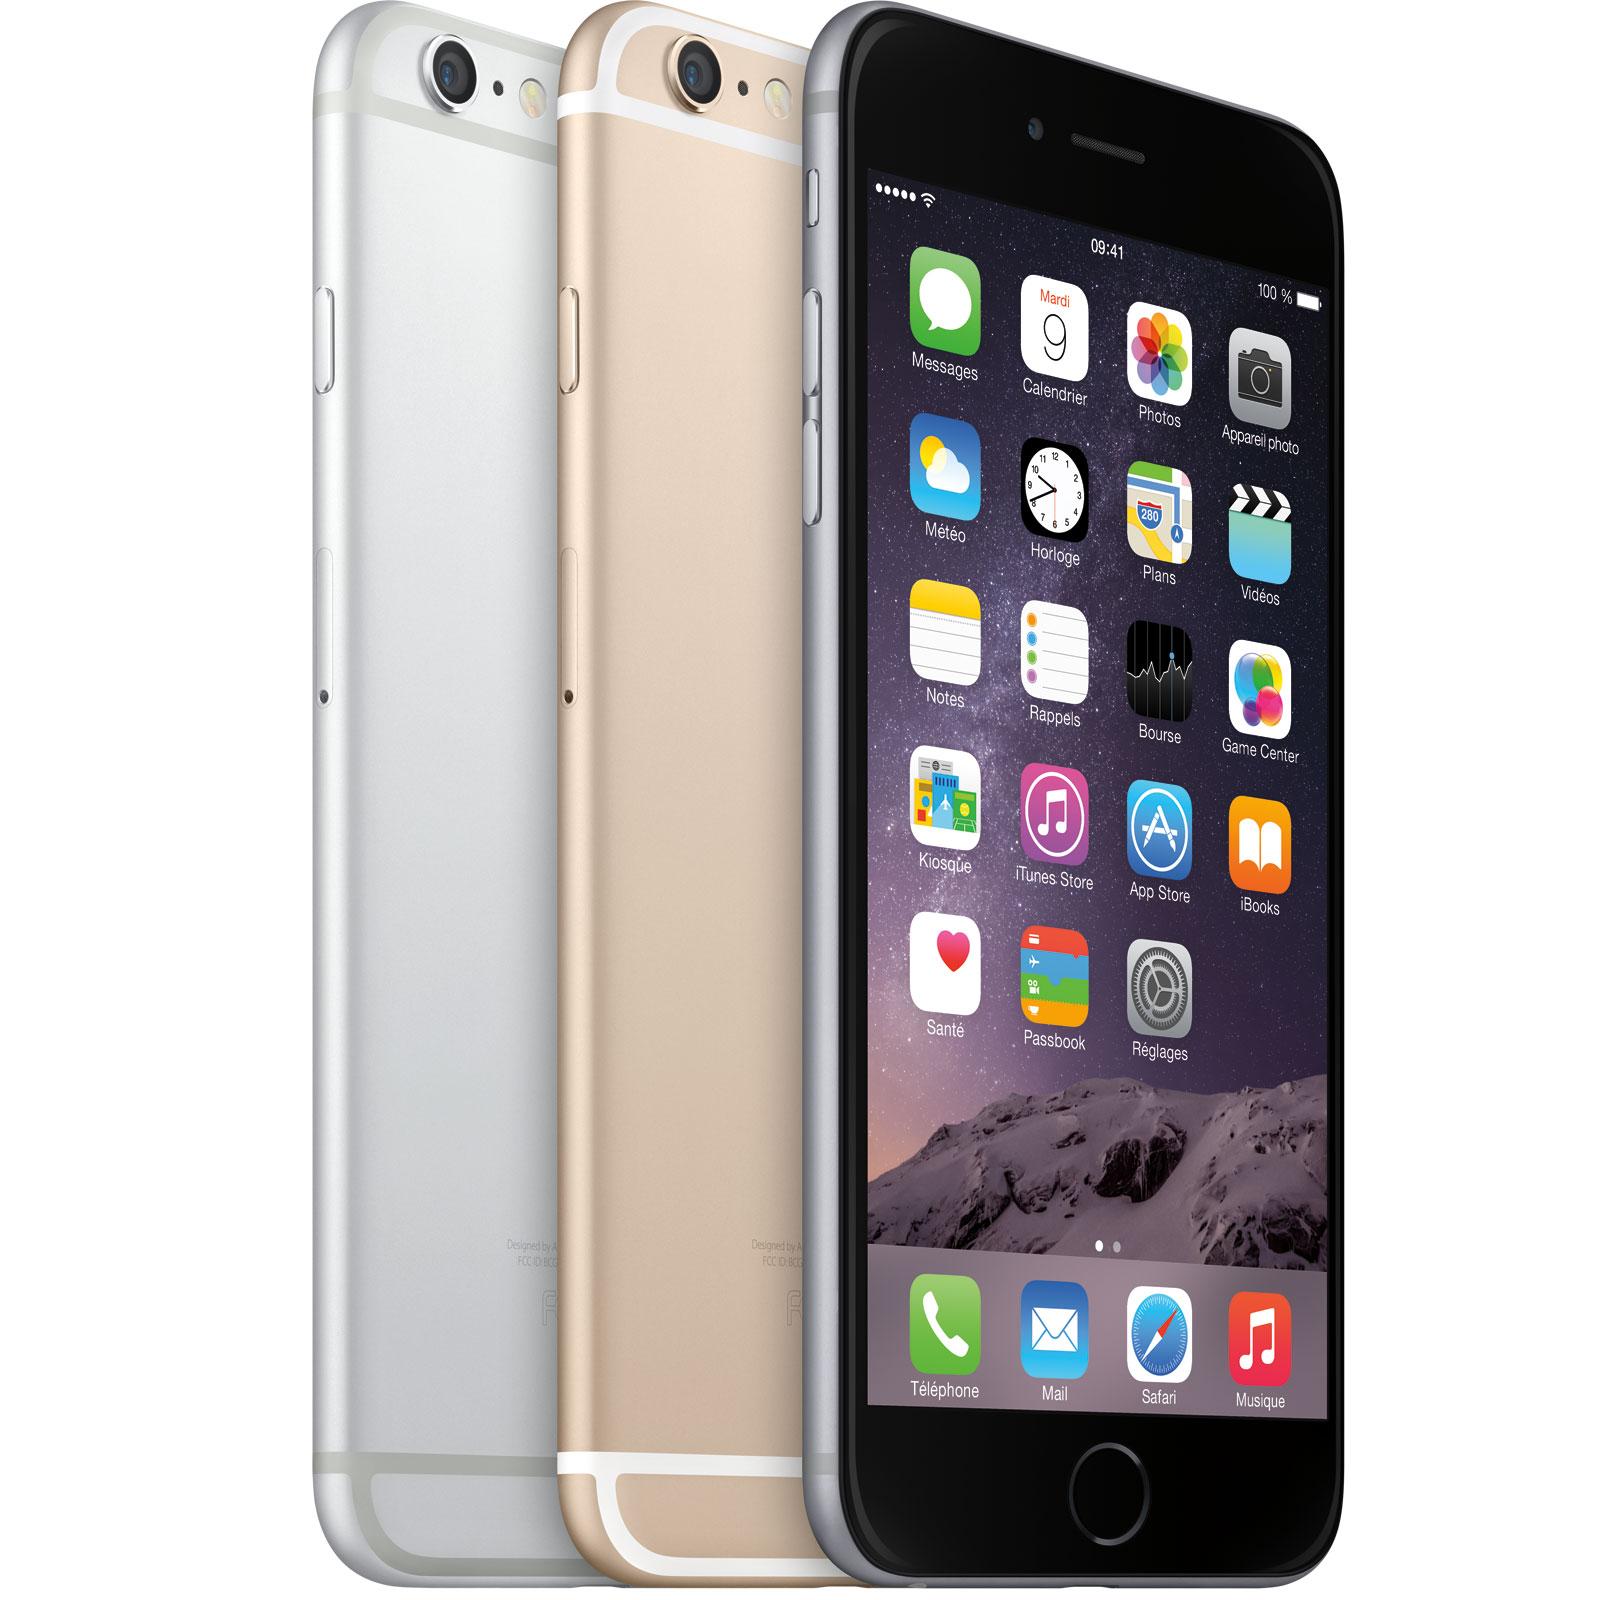 apple iphone 6 plus 16 go argent mobile smartphone. Black Bedroom Furniture Sets. Home Design Ideas